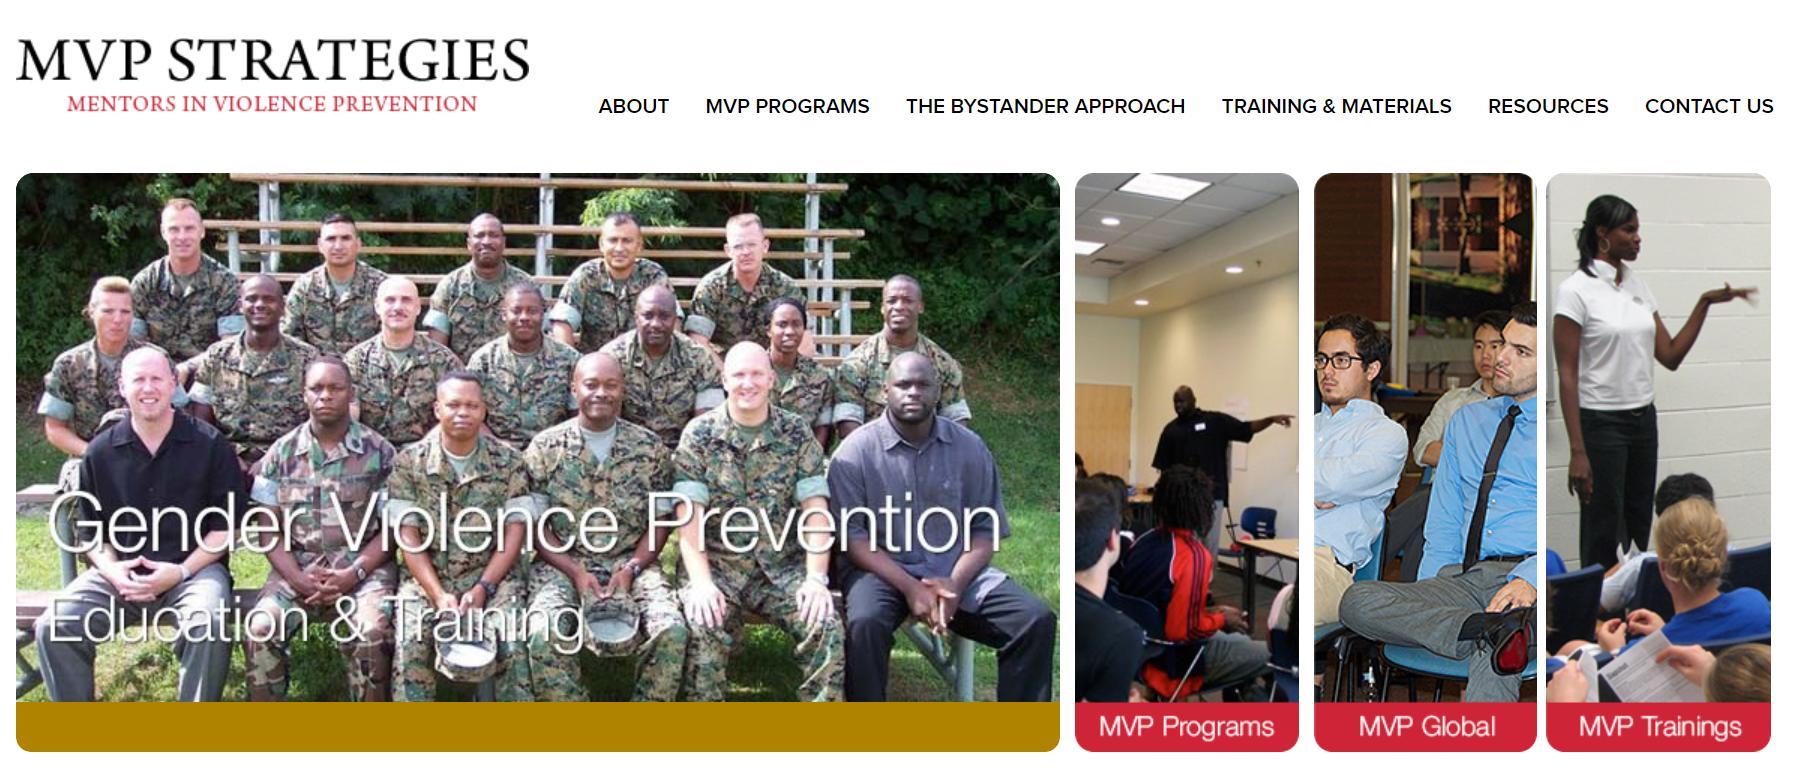 Mentors in Violence Prevention: MVP Violence Prevention